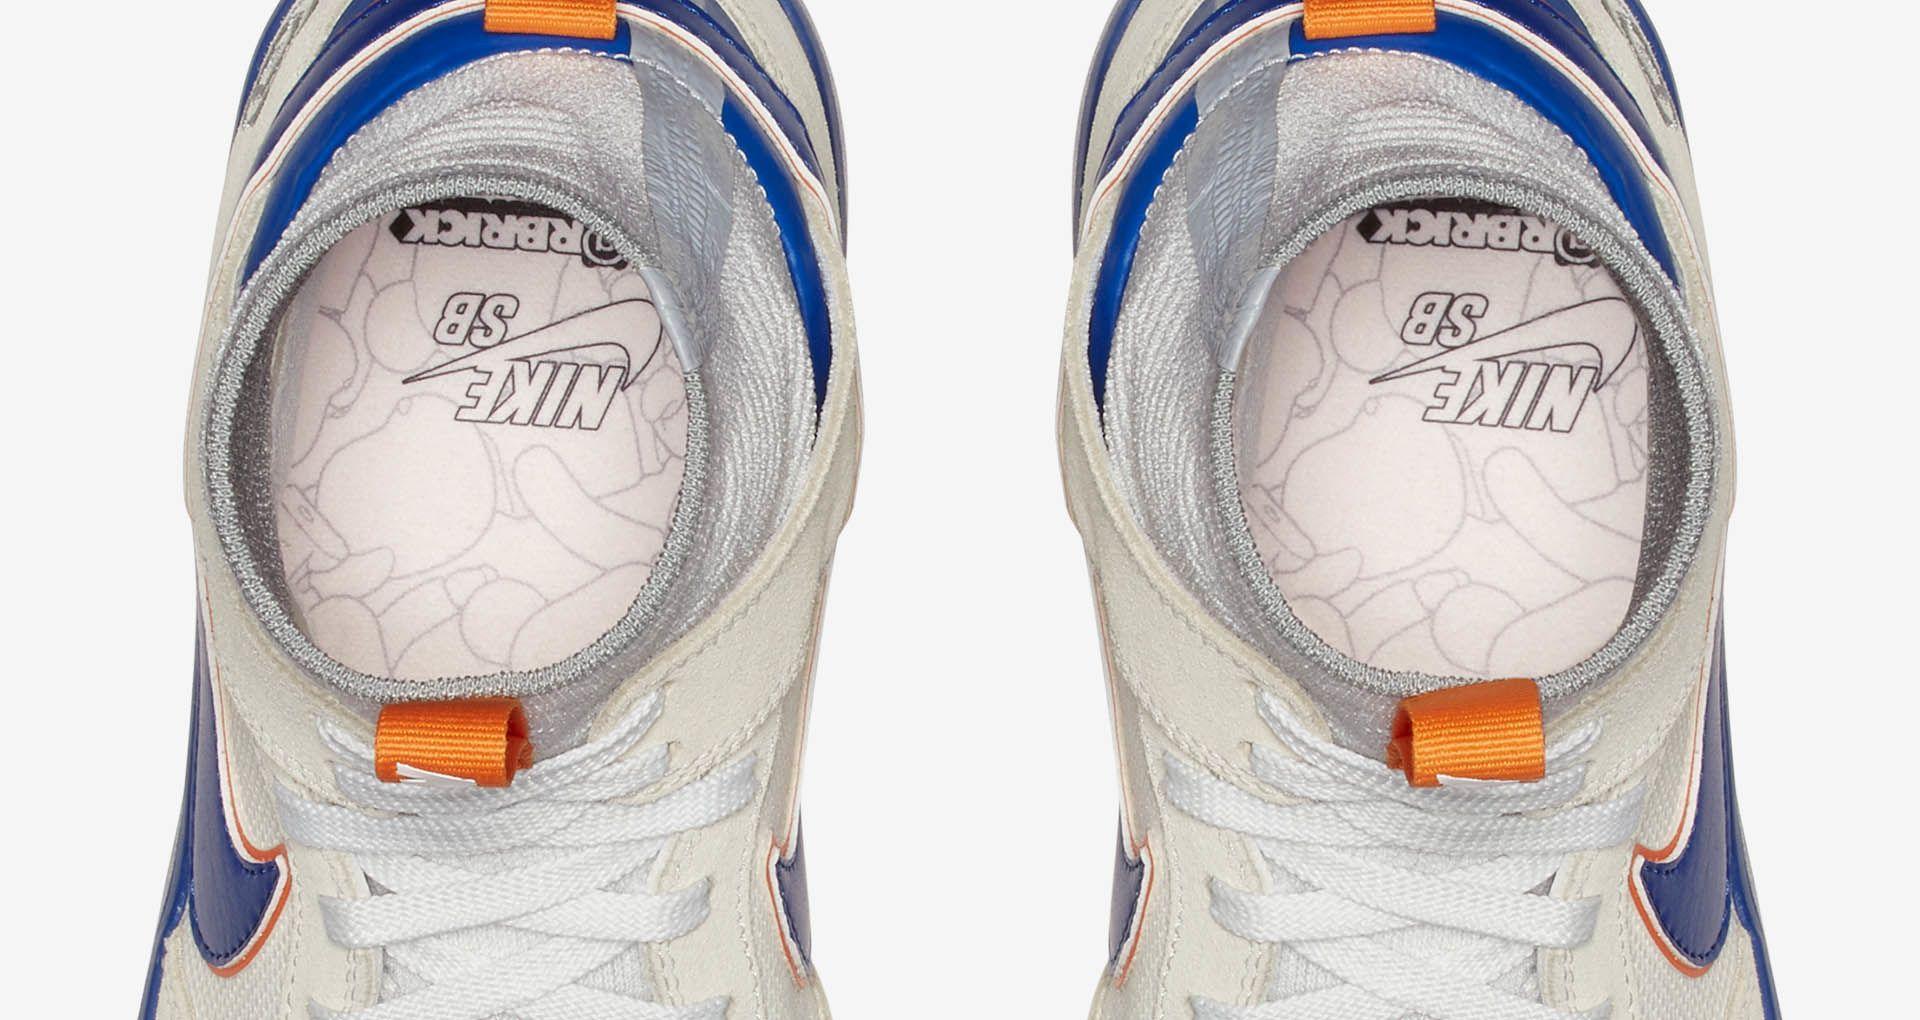 huge sale new release professional sale Nike SB Zoom Dunk High Elite Be@rbrick 'White & College Blue ...